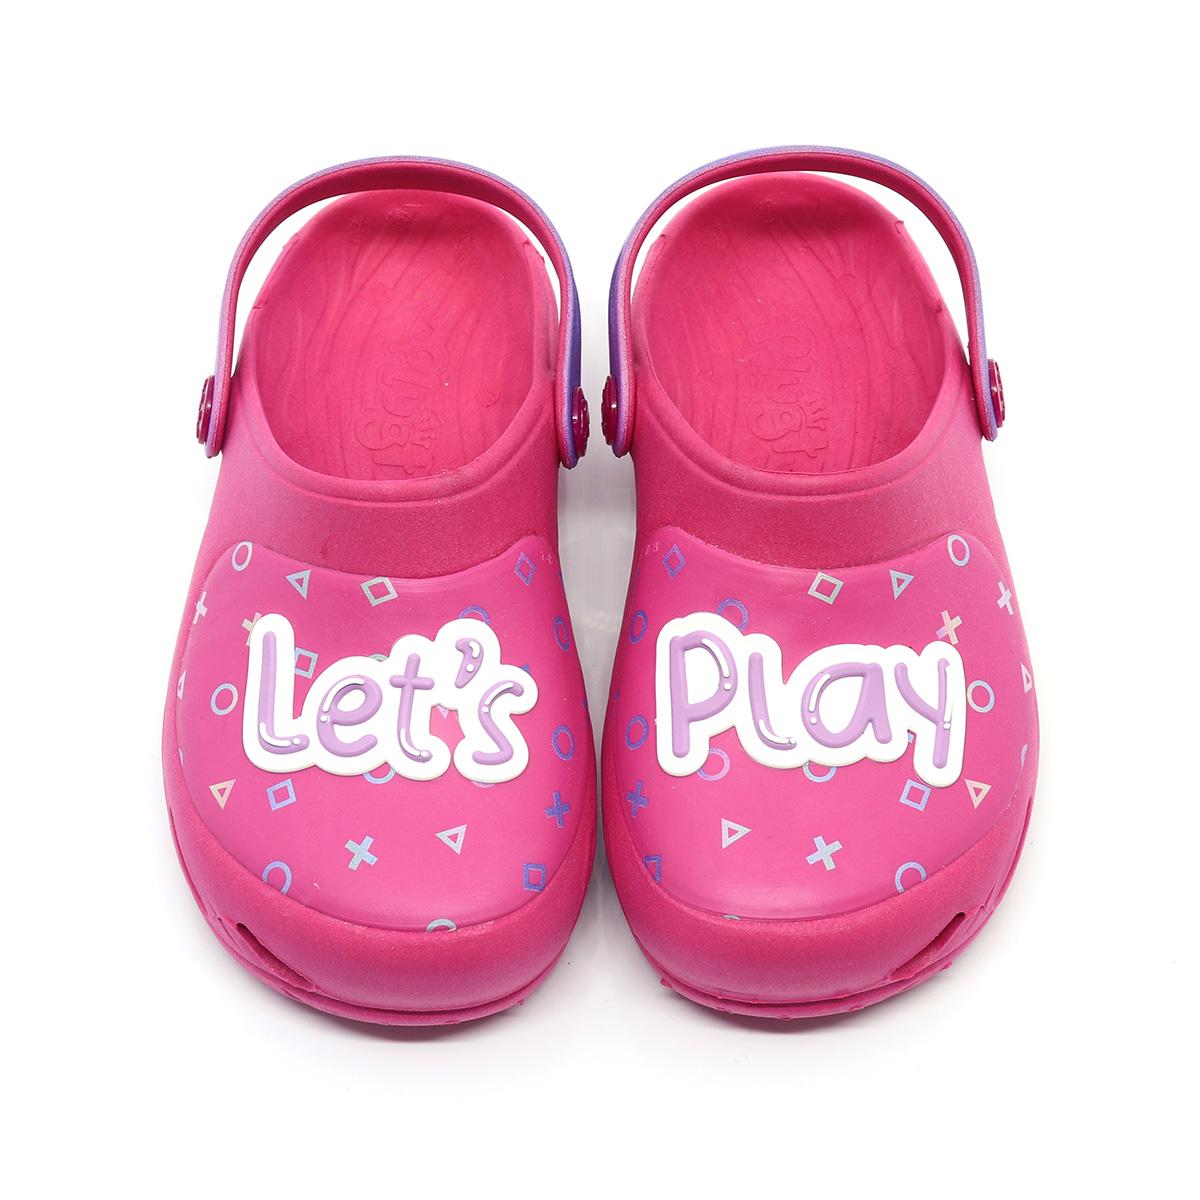 Babuche Plugt Ventor Kids Menina Gamer Pink